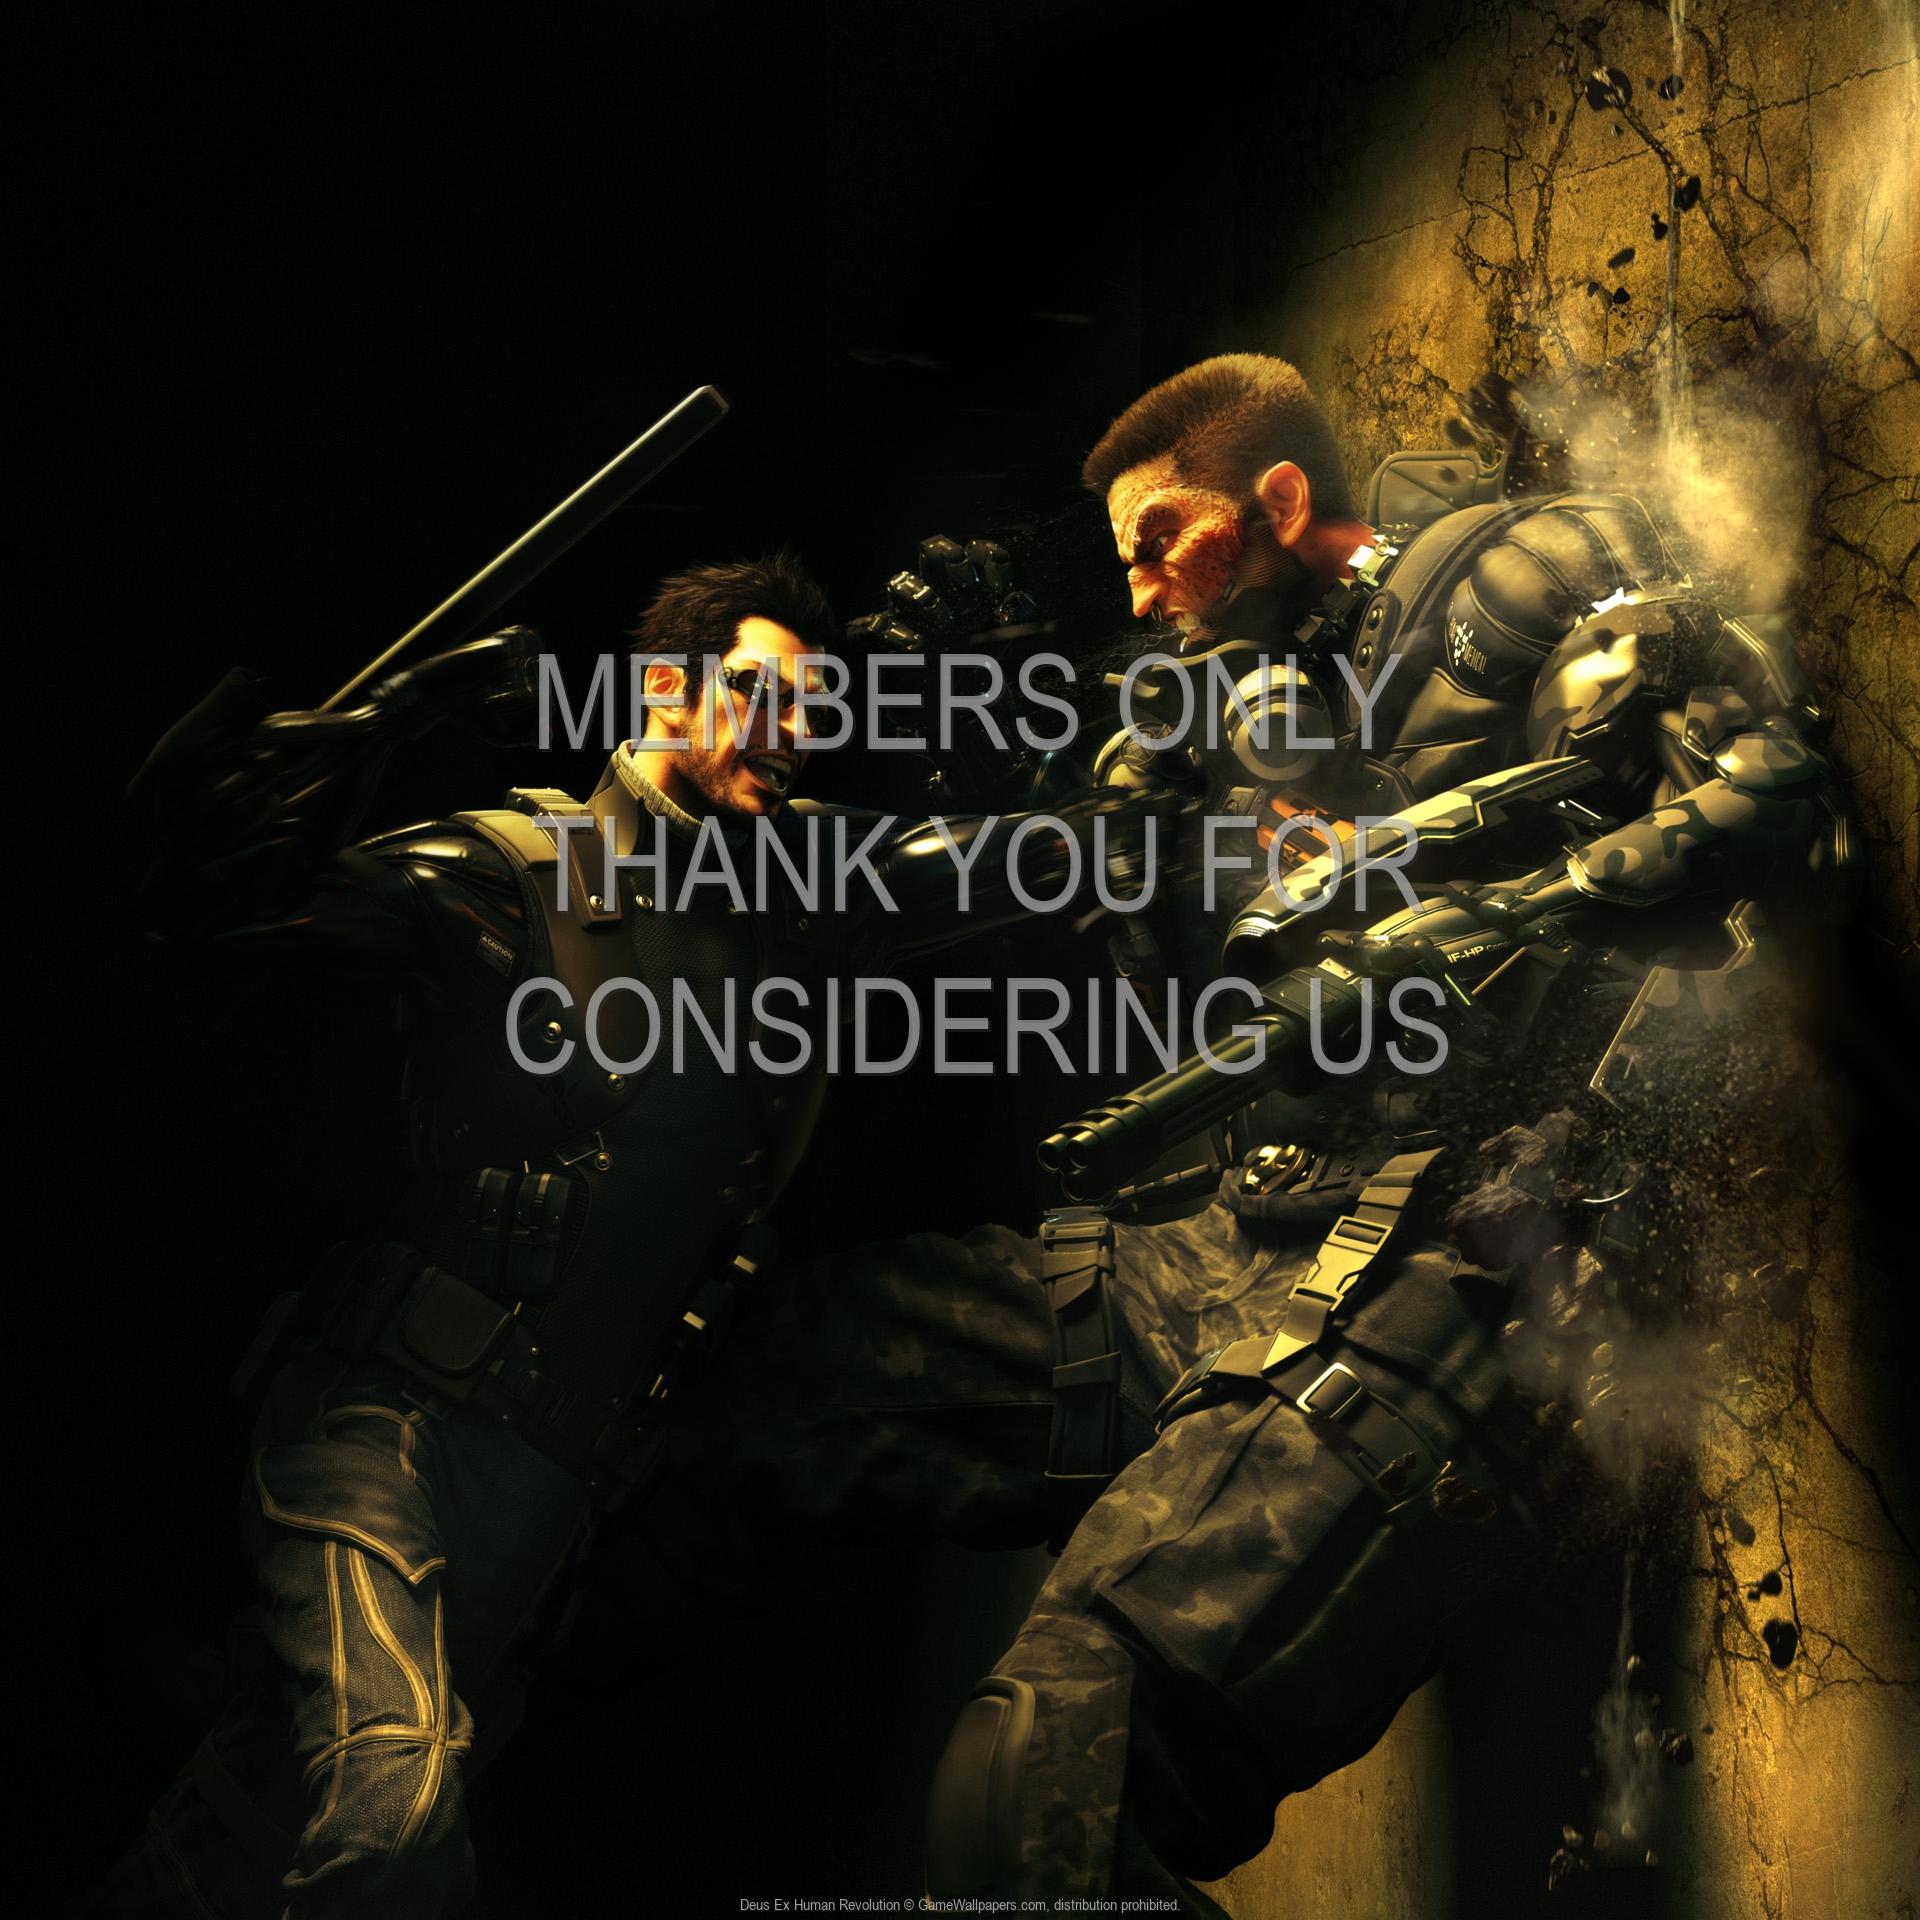 Deus Ex: Human Revolution 1920x1080 Handy Hintergrundbild 13